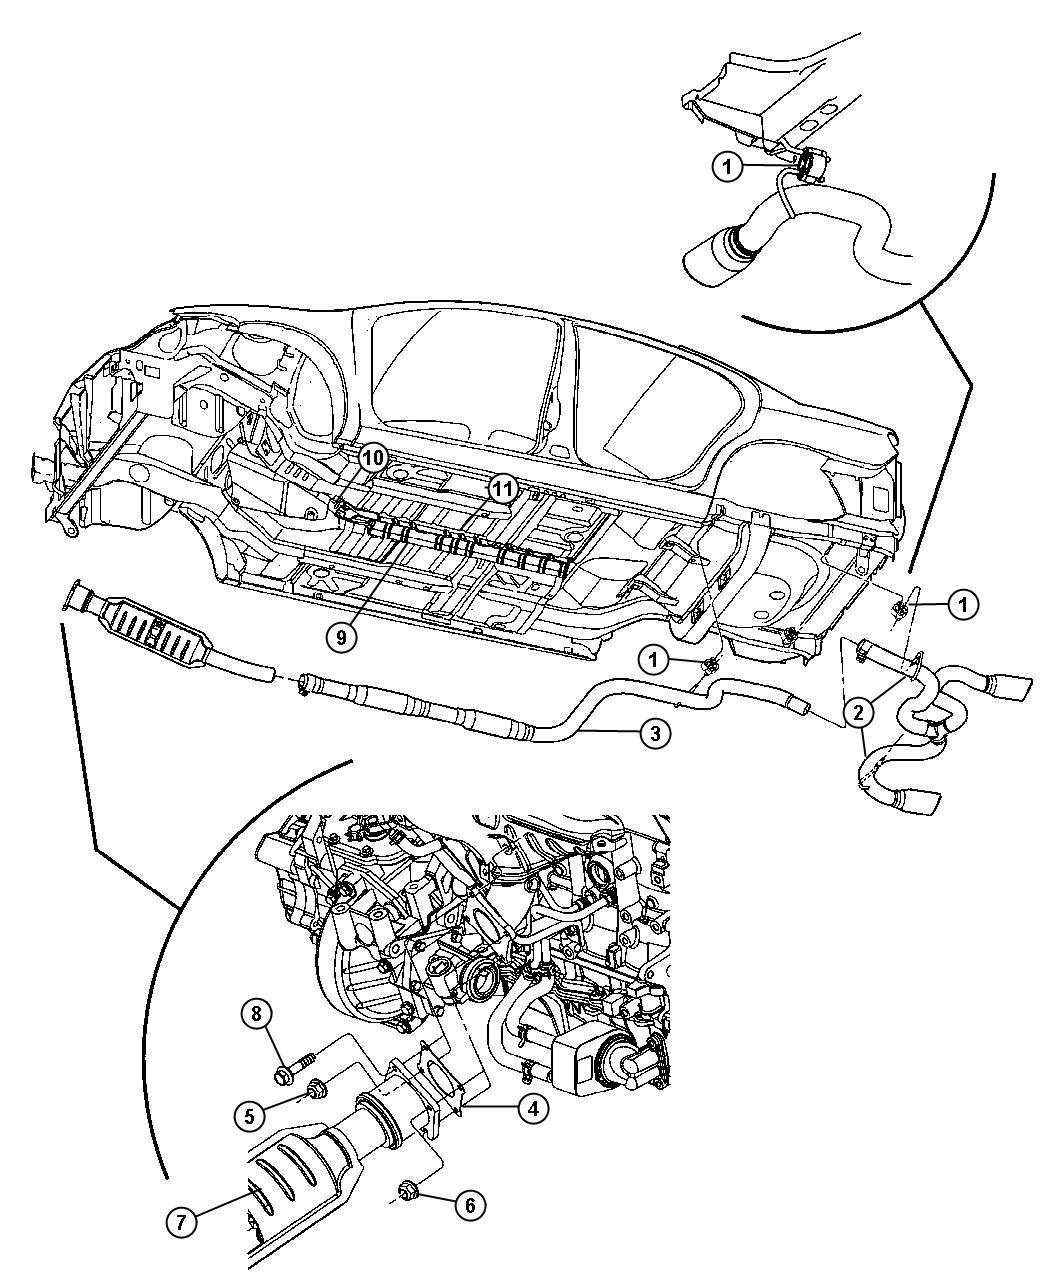 Dodge Neon Exhaust System Engine